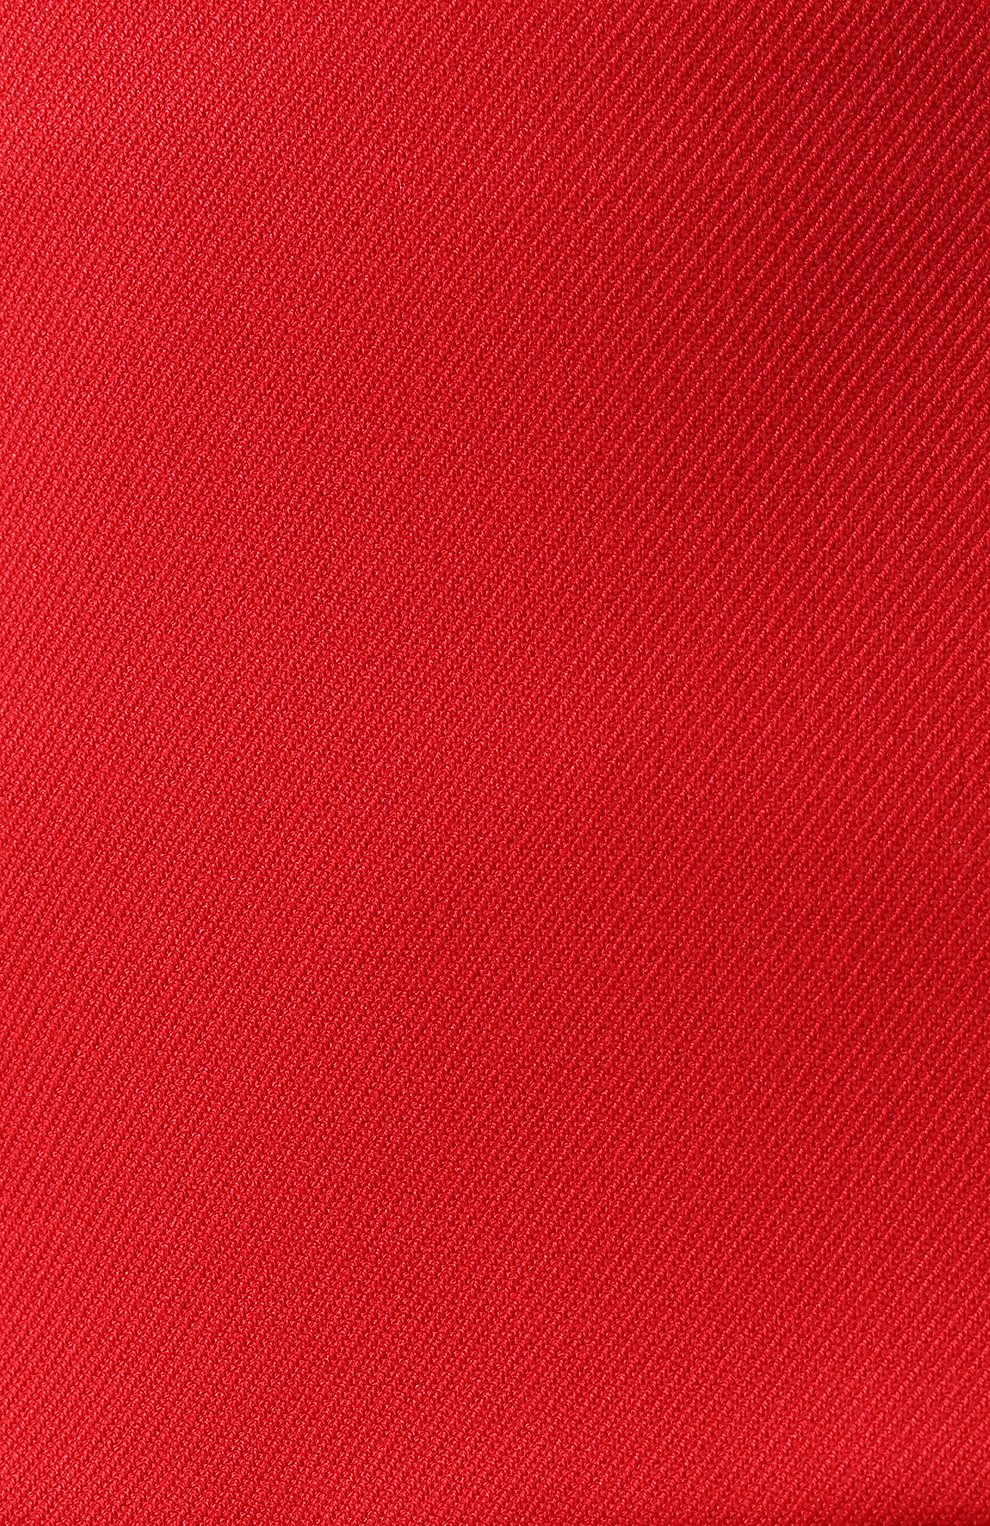 Женские юбка-шорты REDVALENTINO красного цвета, арт. SR3RFB75/1Y1 | Фото 5